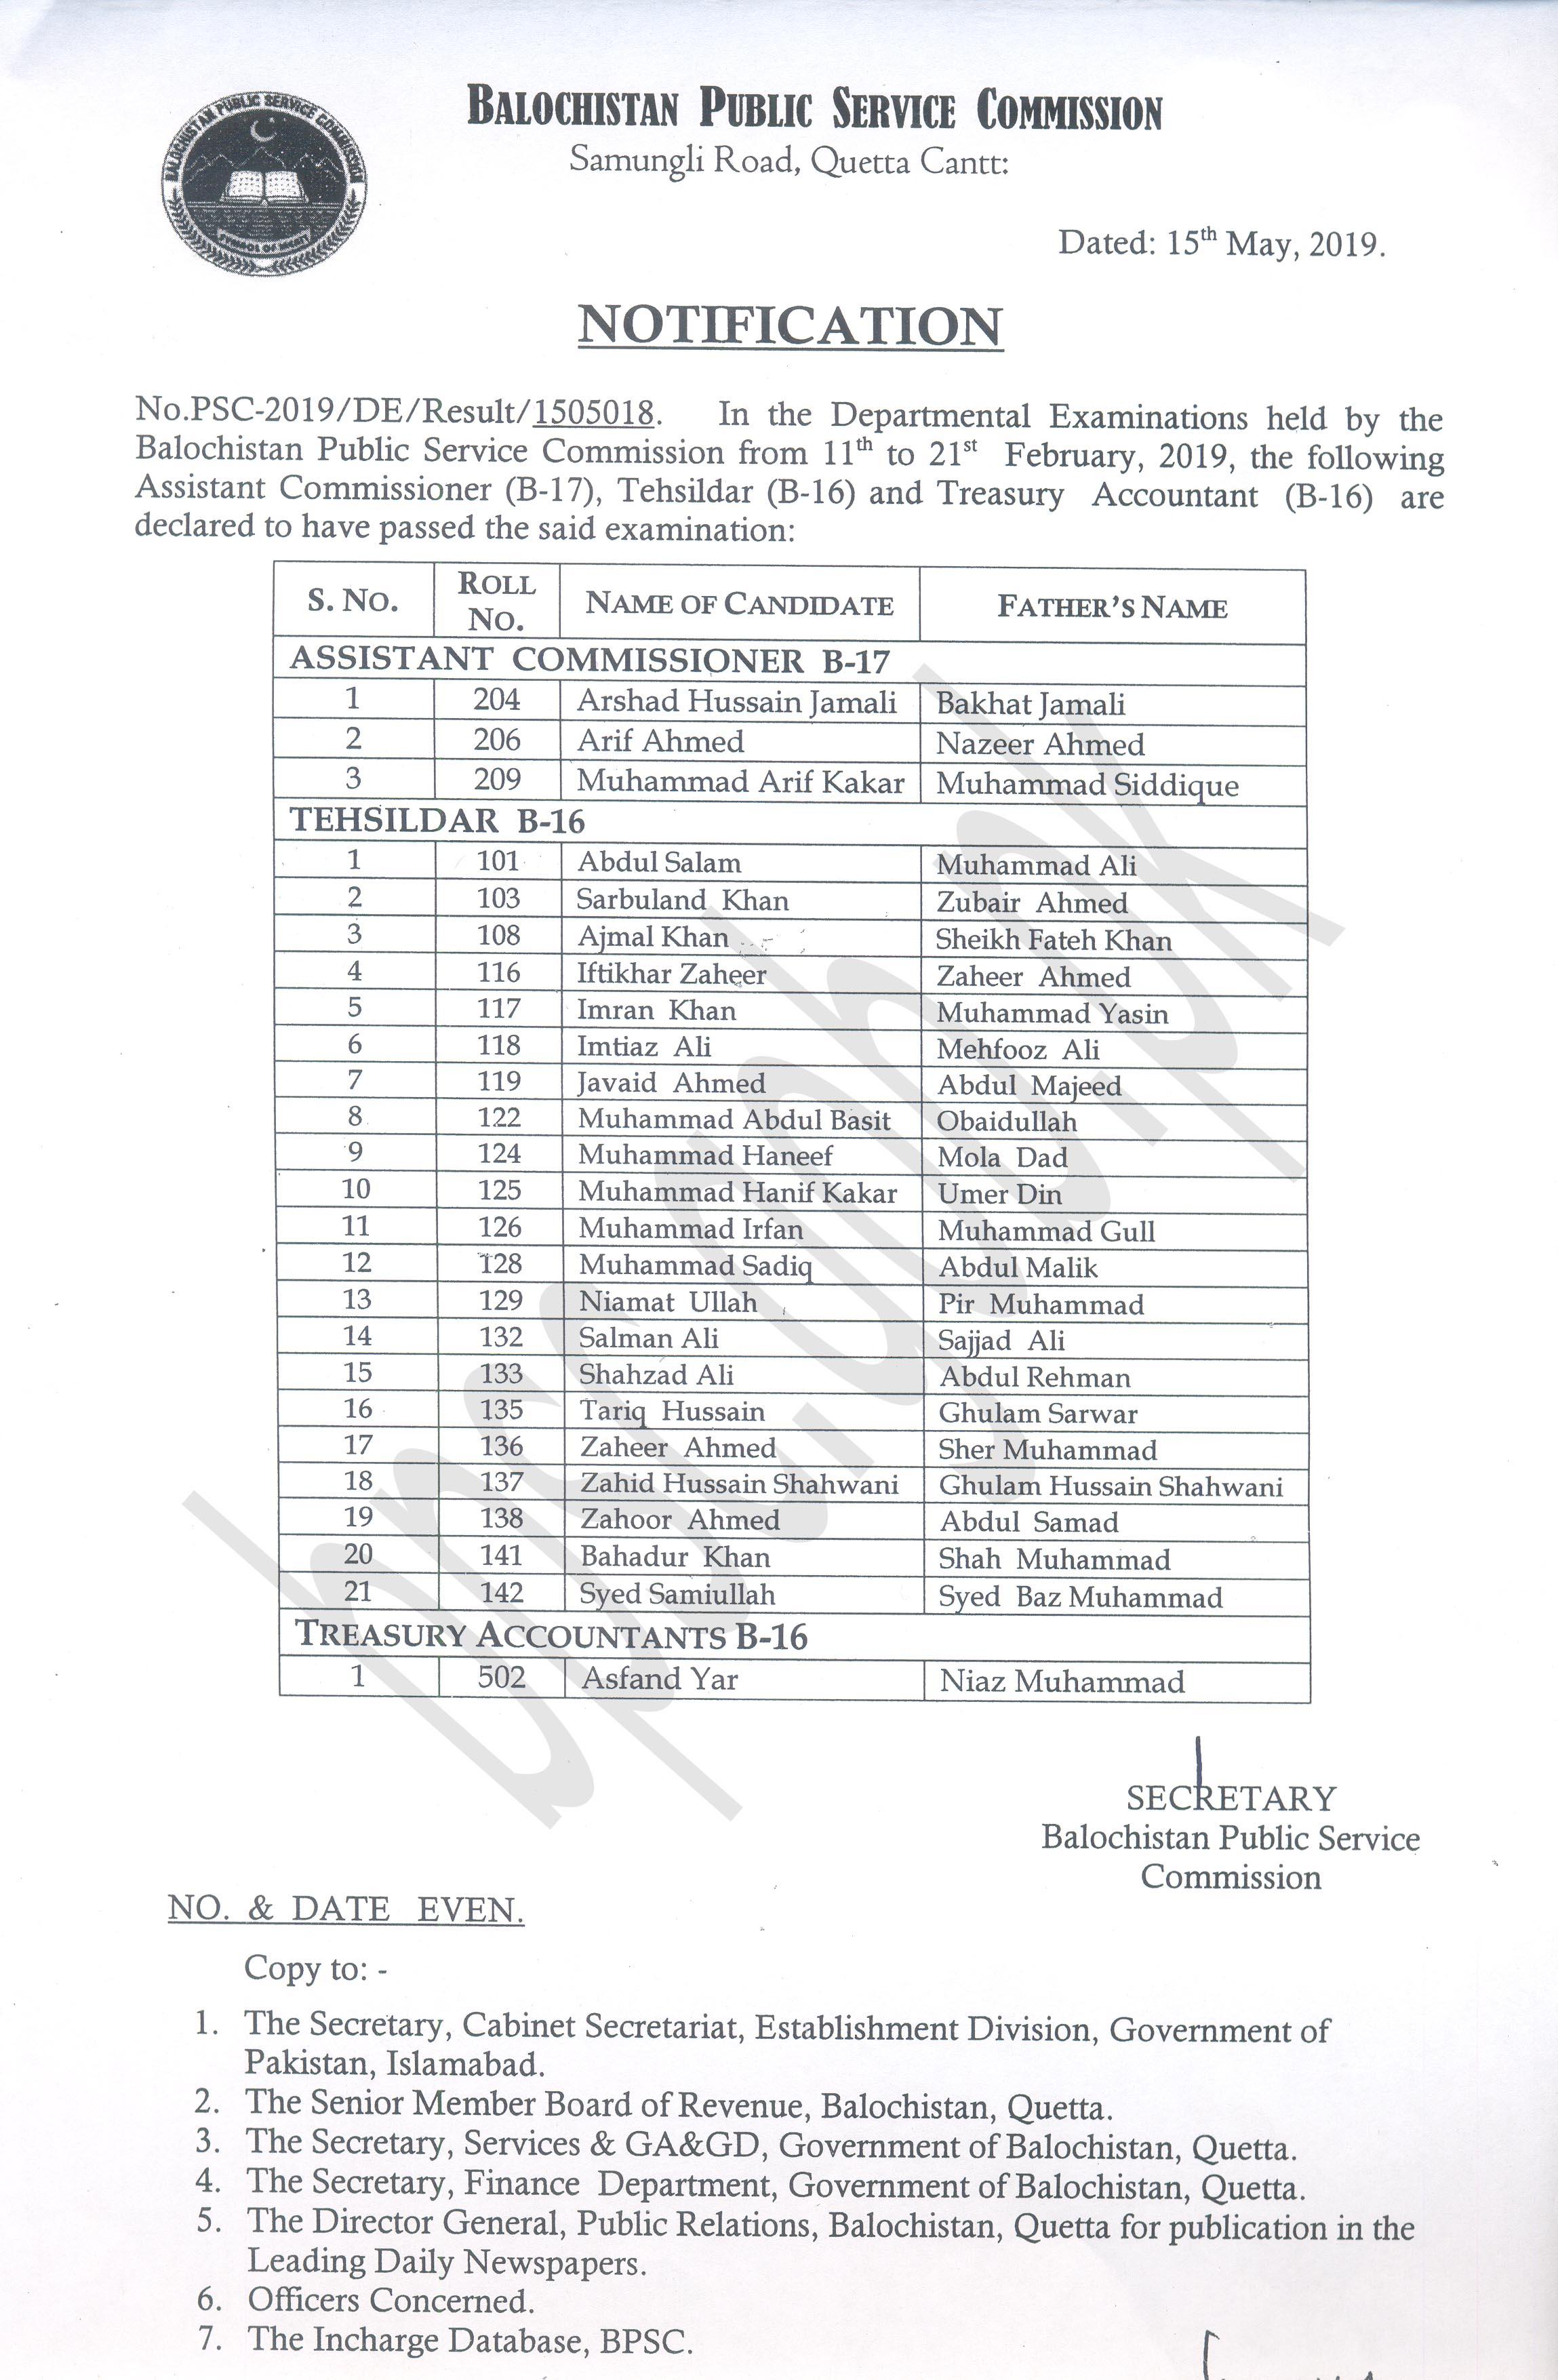 BPSC Departmental Examination Test Result 2019 Quetta BPSC